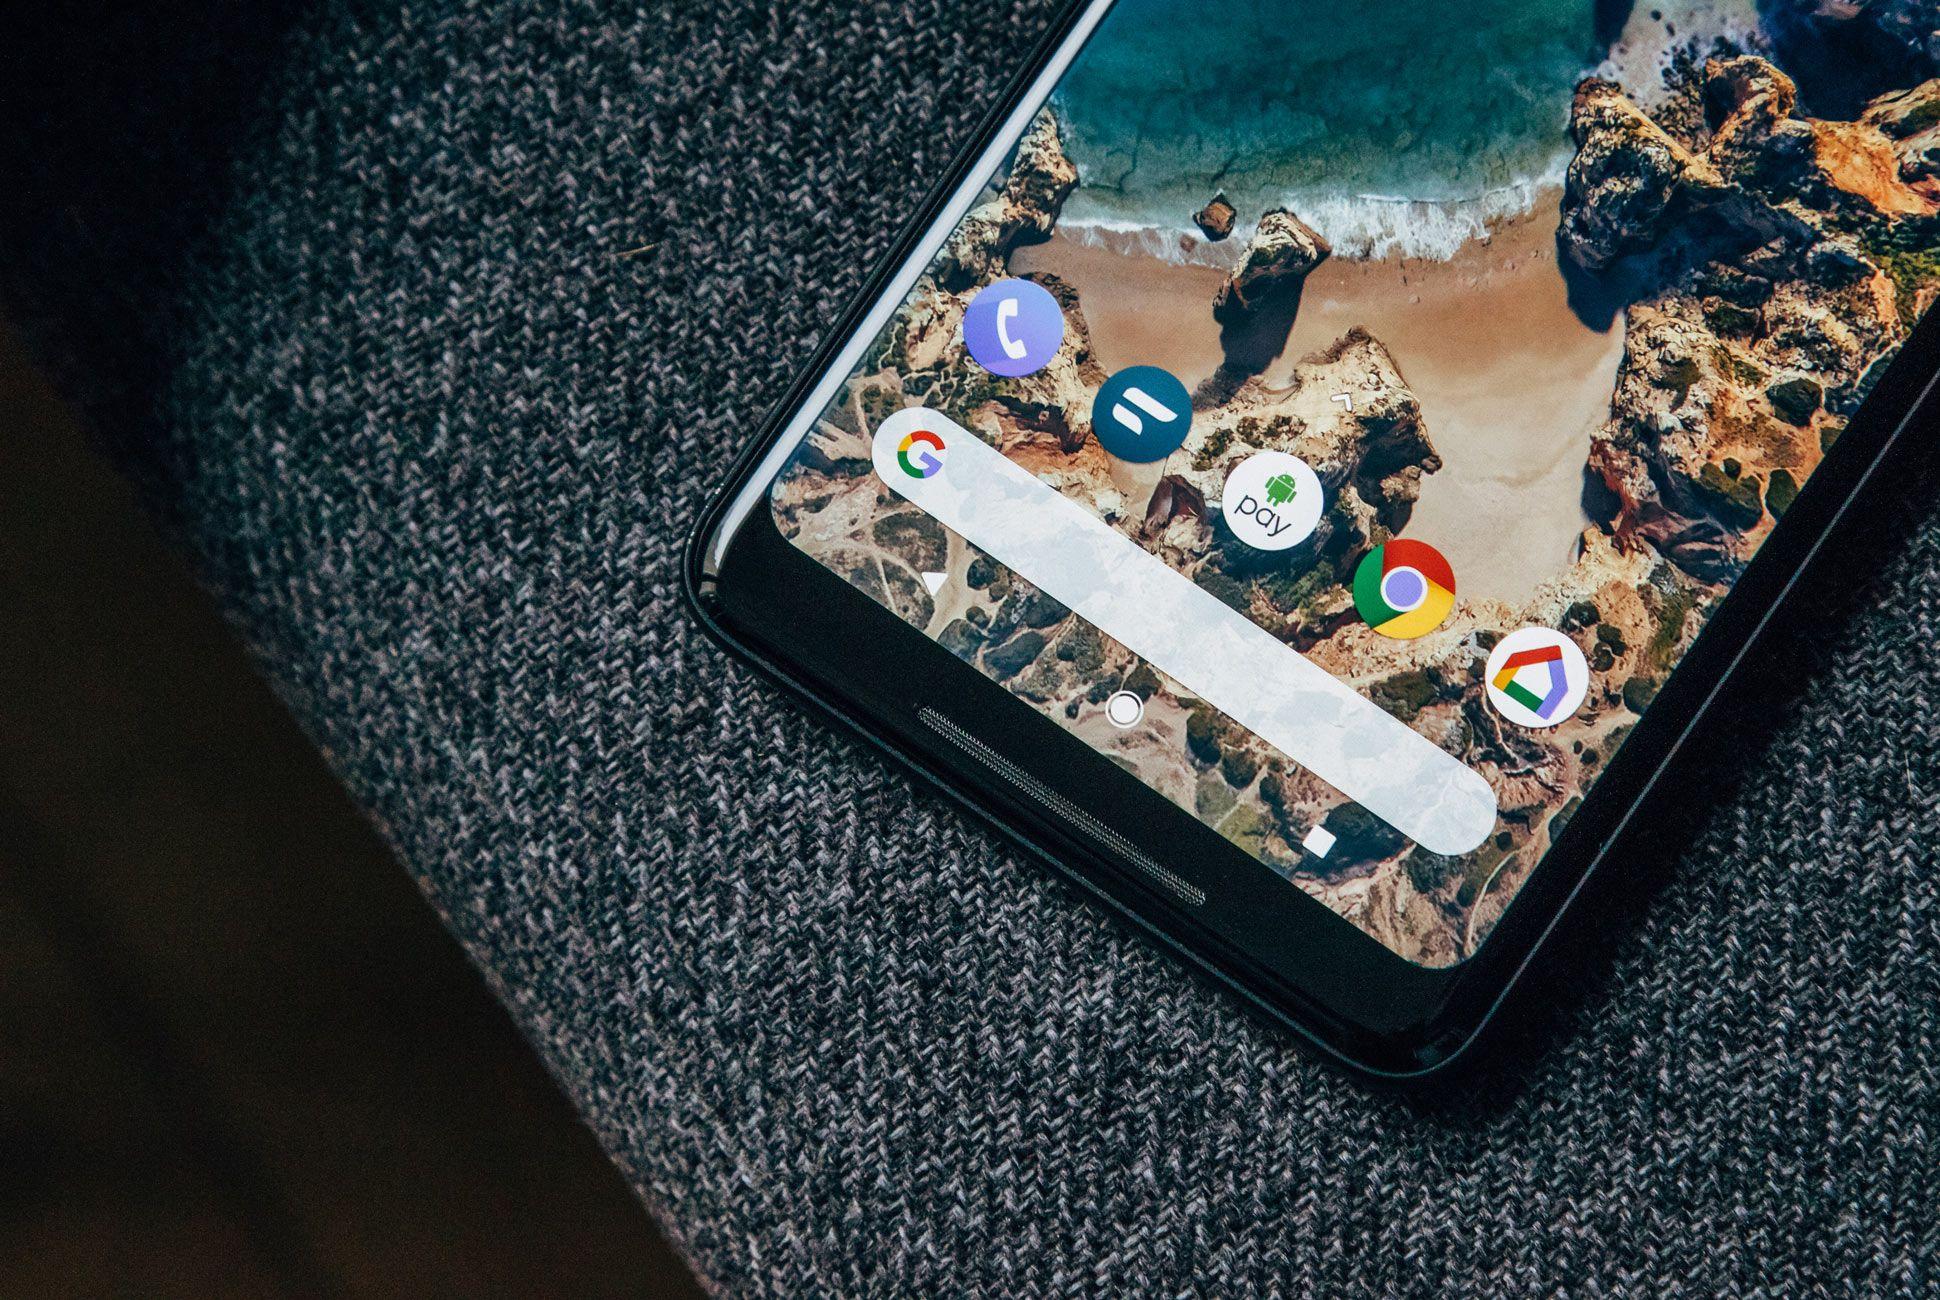 Google-Pixel-2-XL-Review-Gear-Patrol-Slide-3